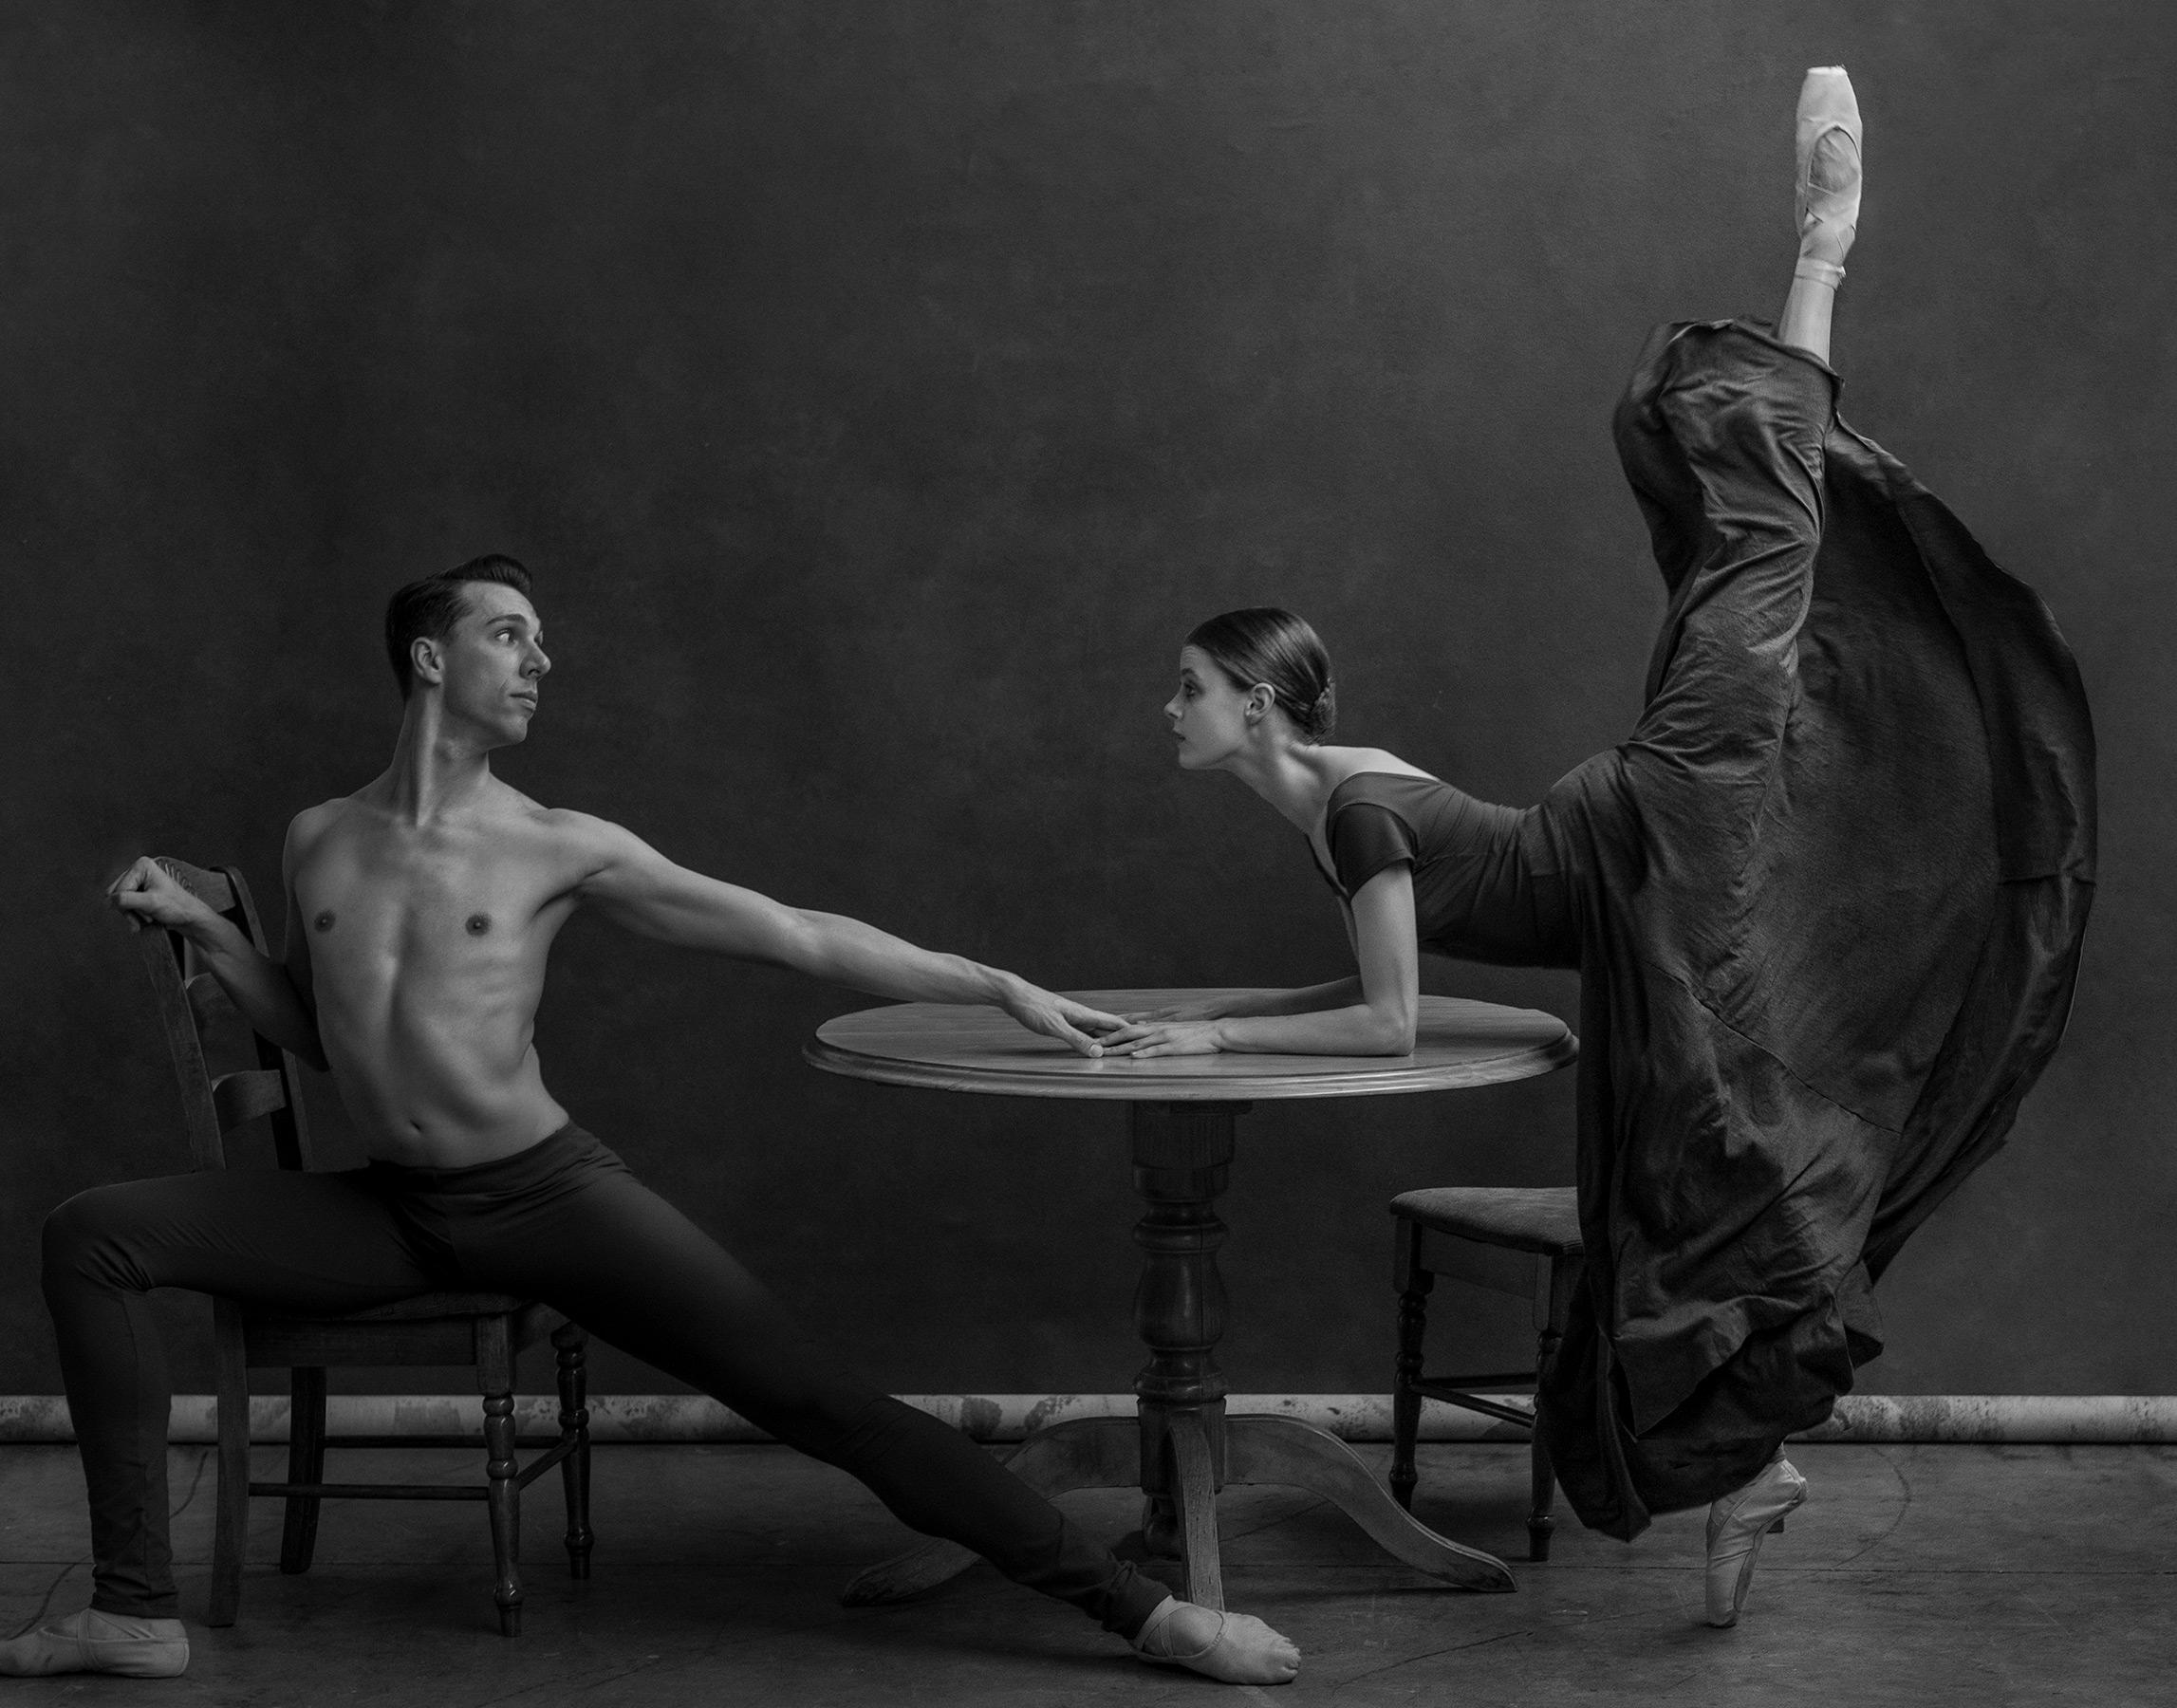 Tessa Puttick & Shaughn Pegararo. The National Dance Theatre of Australia. 2018